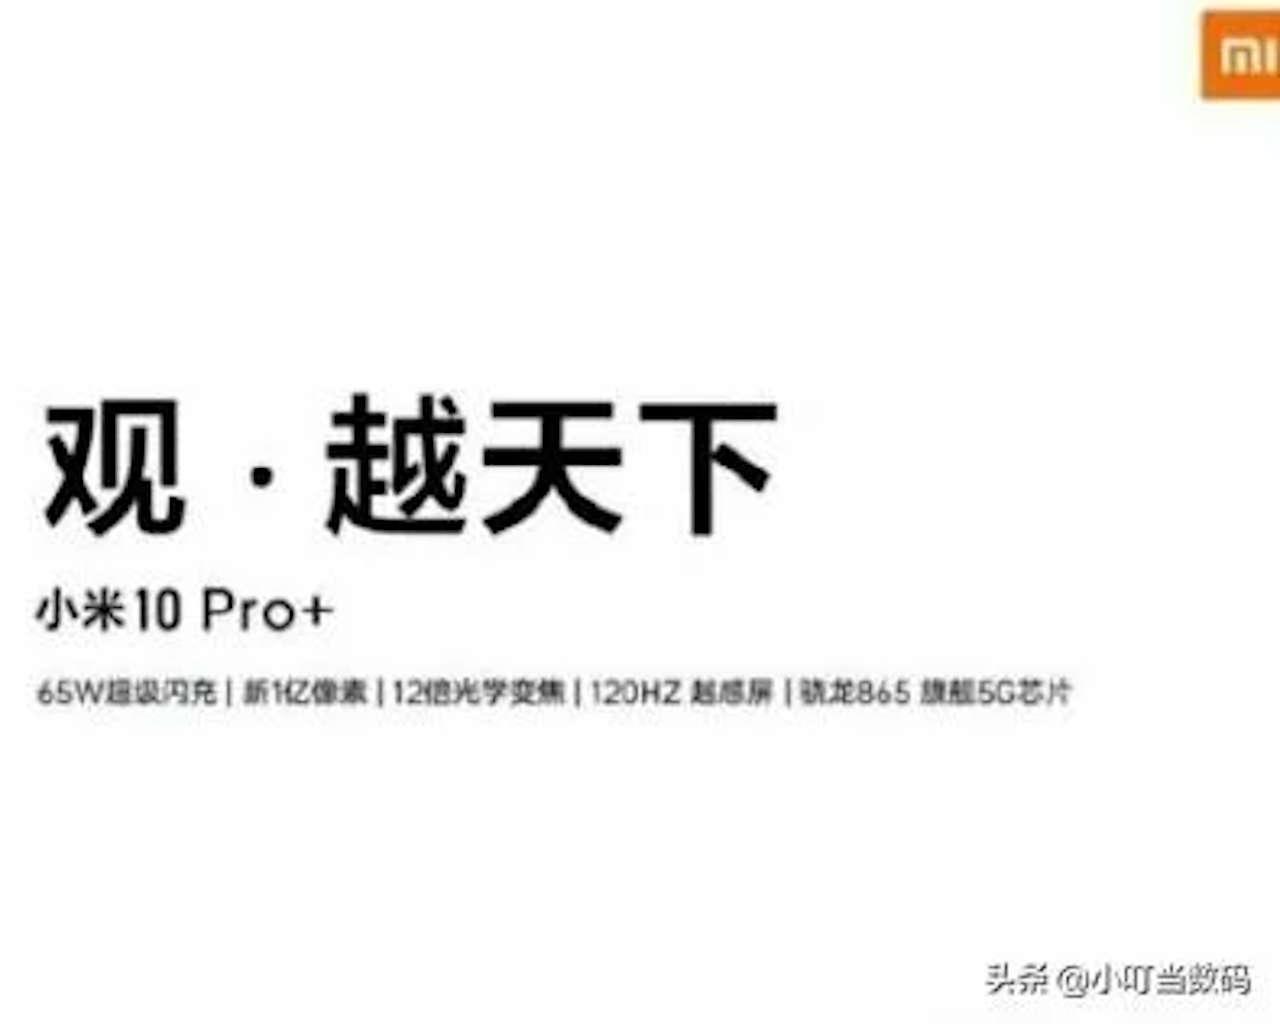 Xiaomi Mi 10 Pro+ ancora più potente: Snap 865+, 16 GB, 120 Hz ...